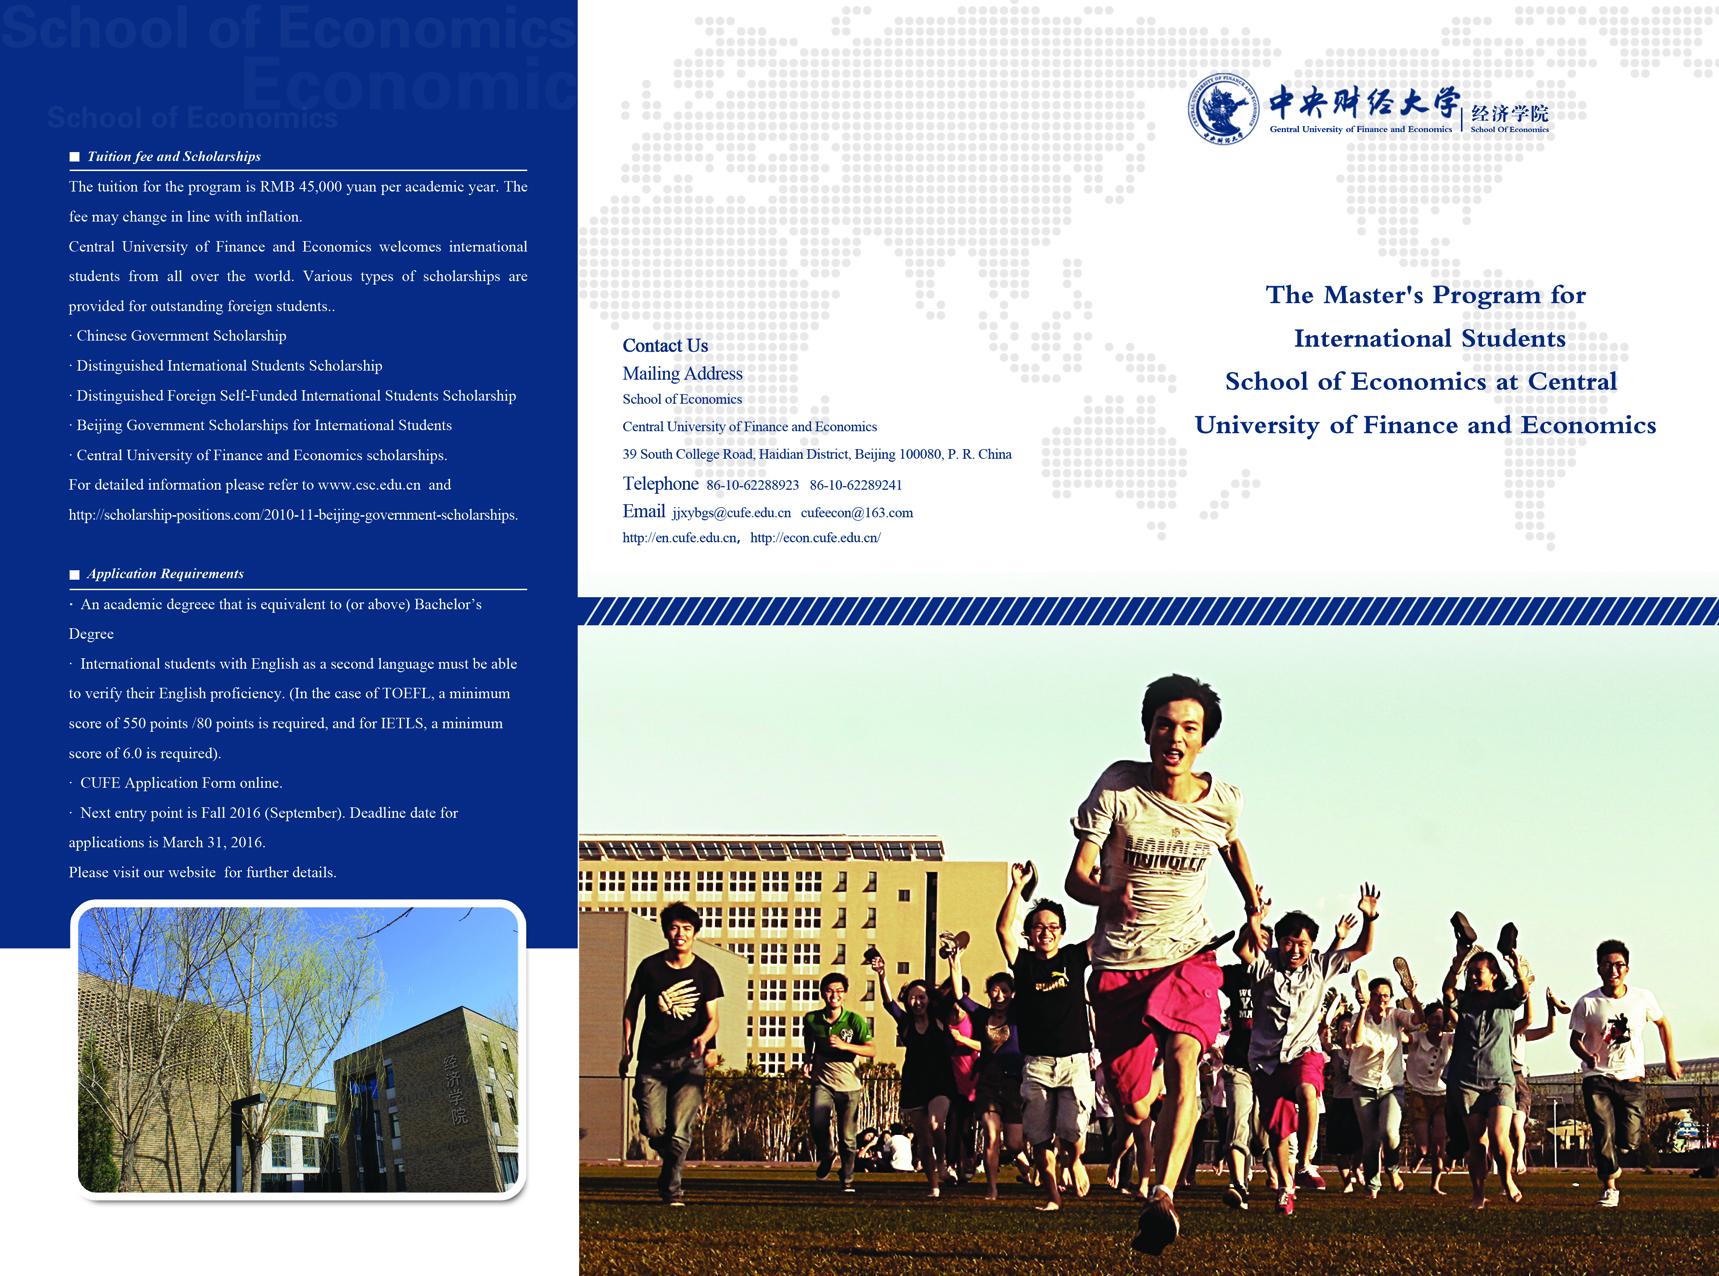 The Master's Program for International Students:School of